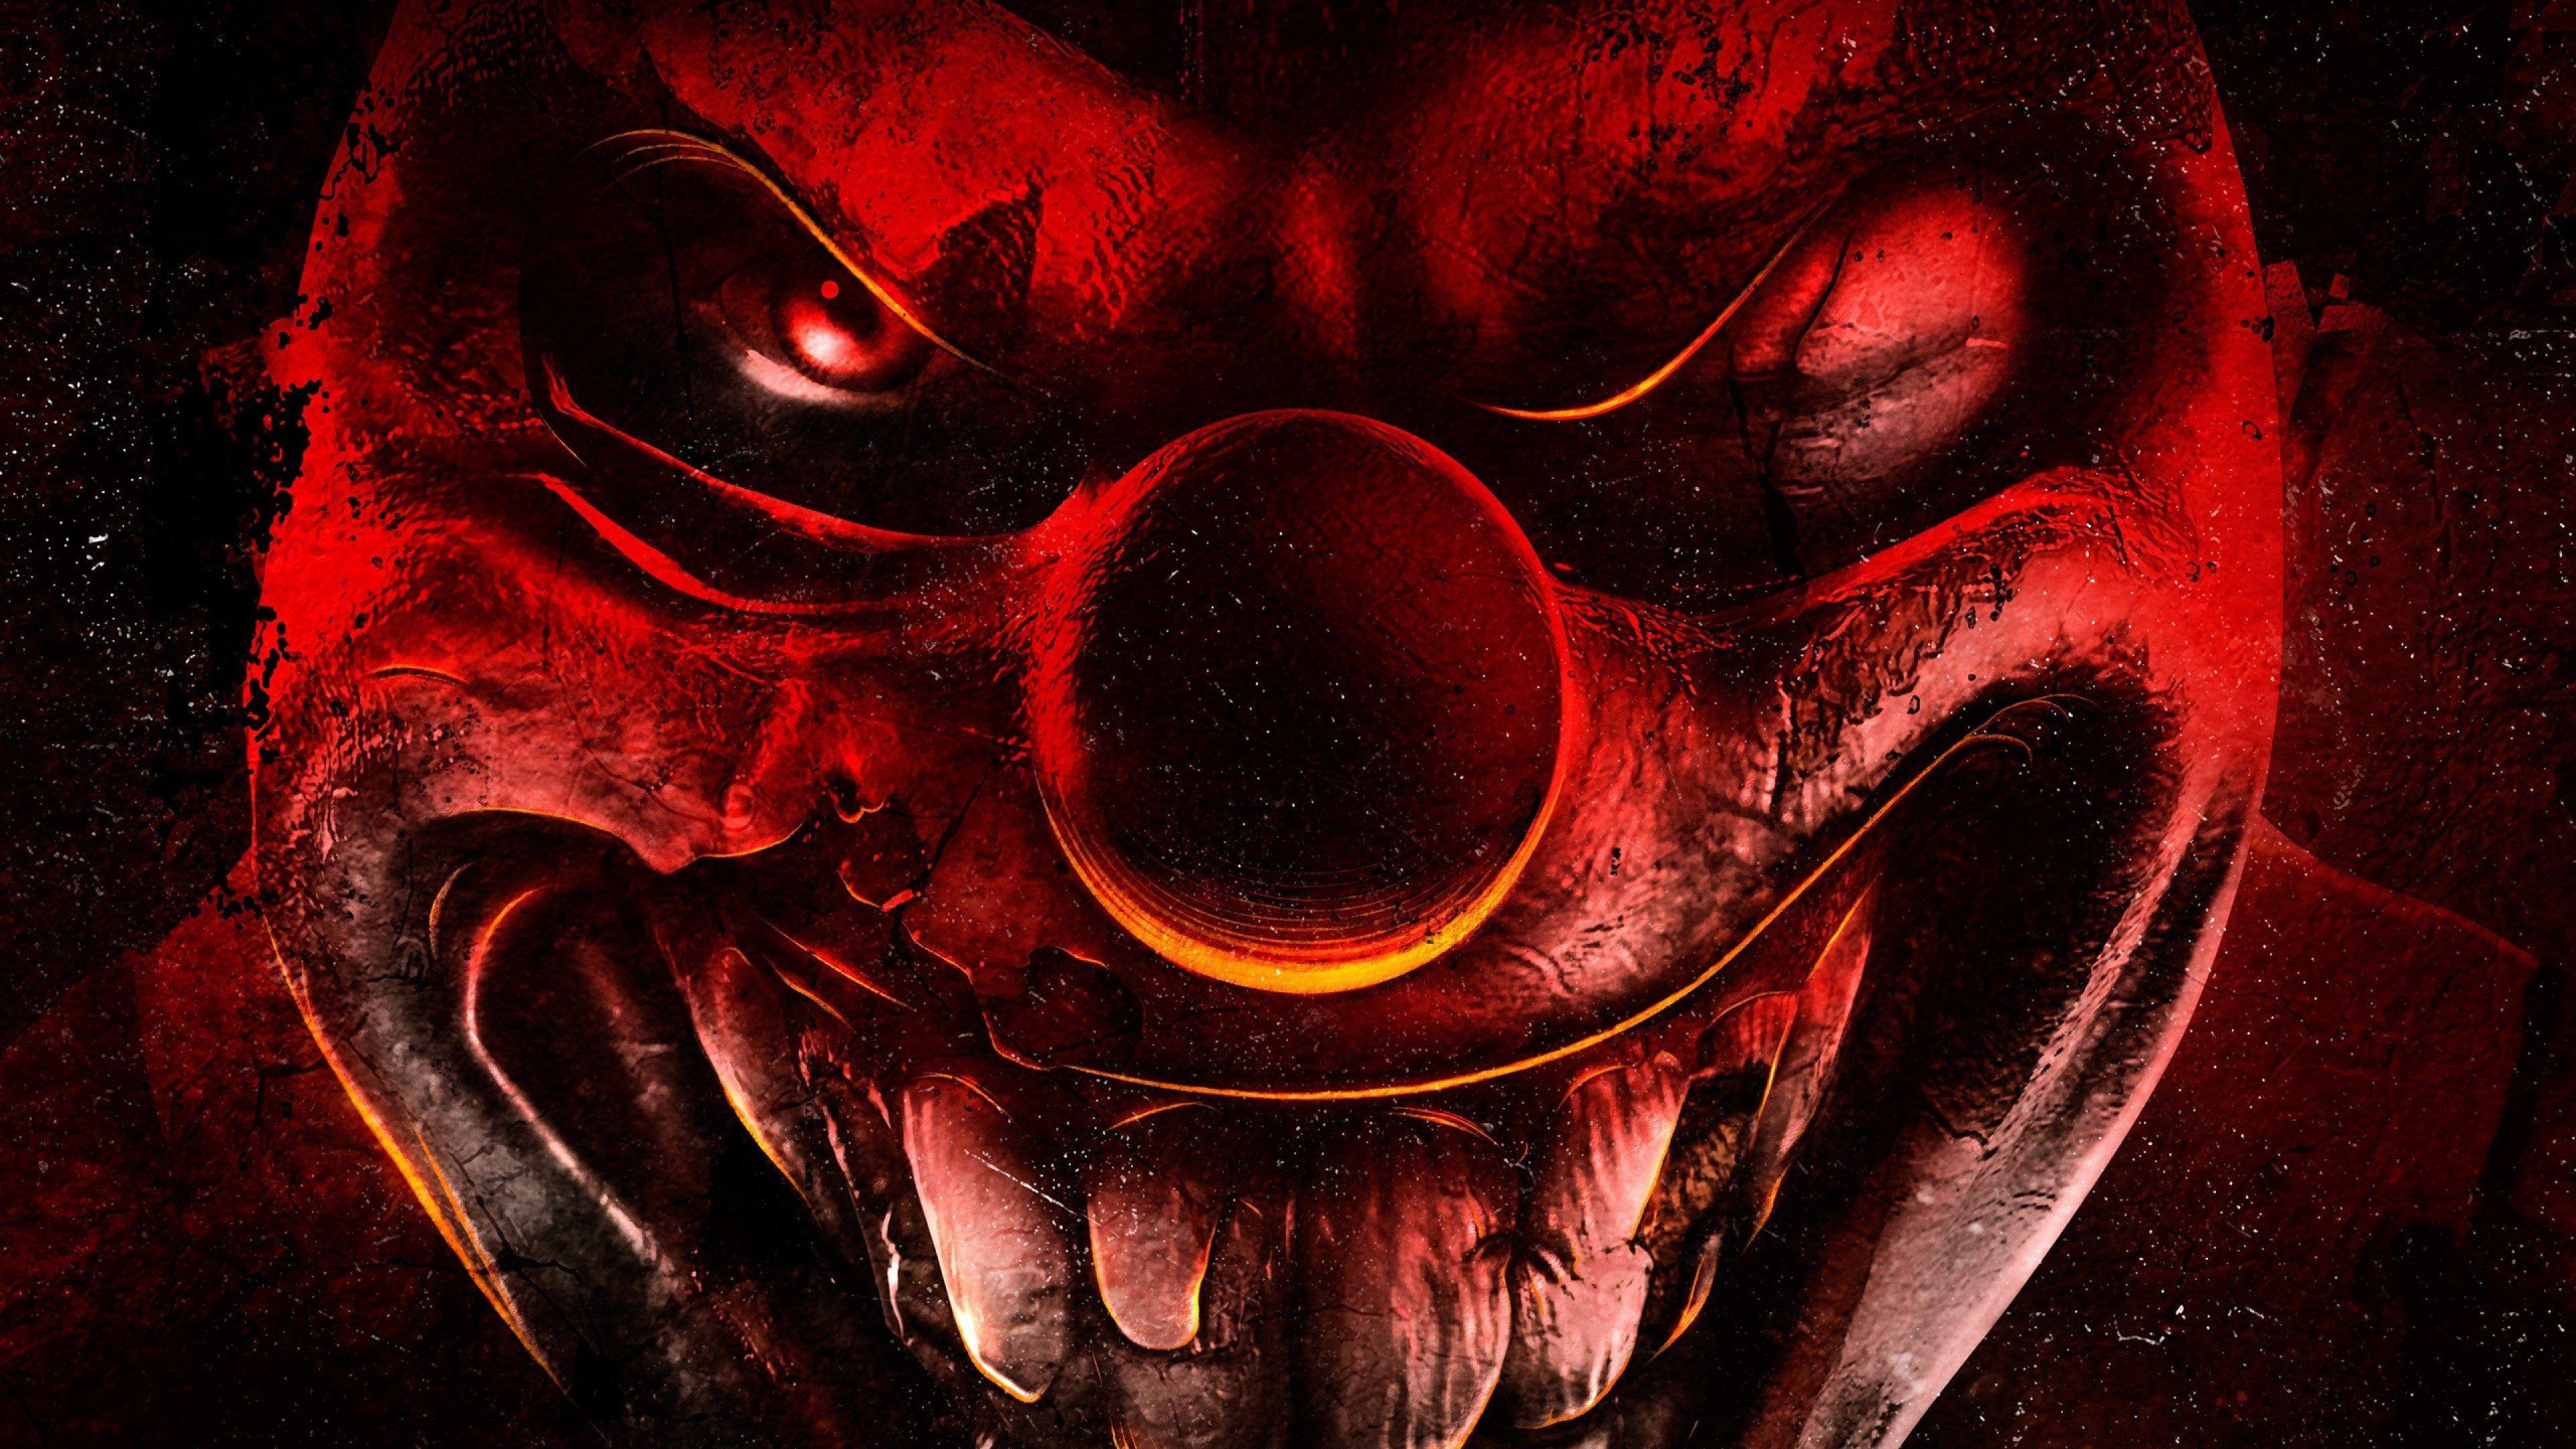 3840x2160 Twisted Metal 4k Free Hd Wallpaper Free Download Scary Clown Pics Scary Clowns Evil Clowns